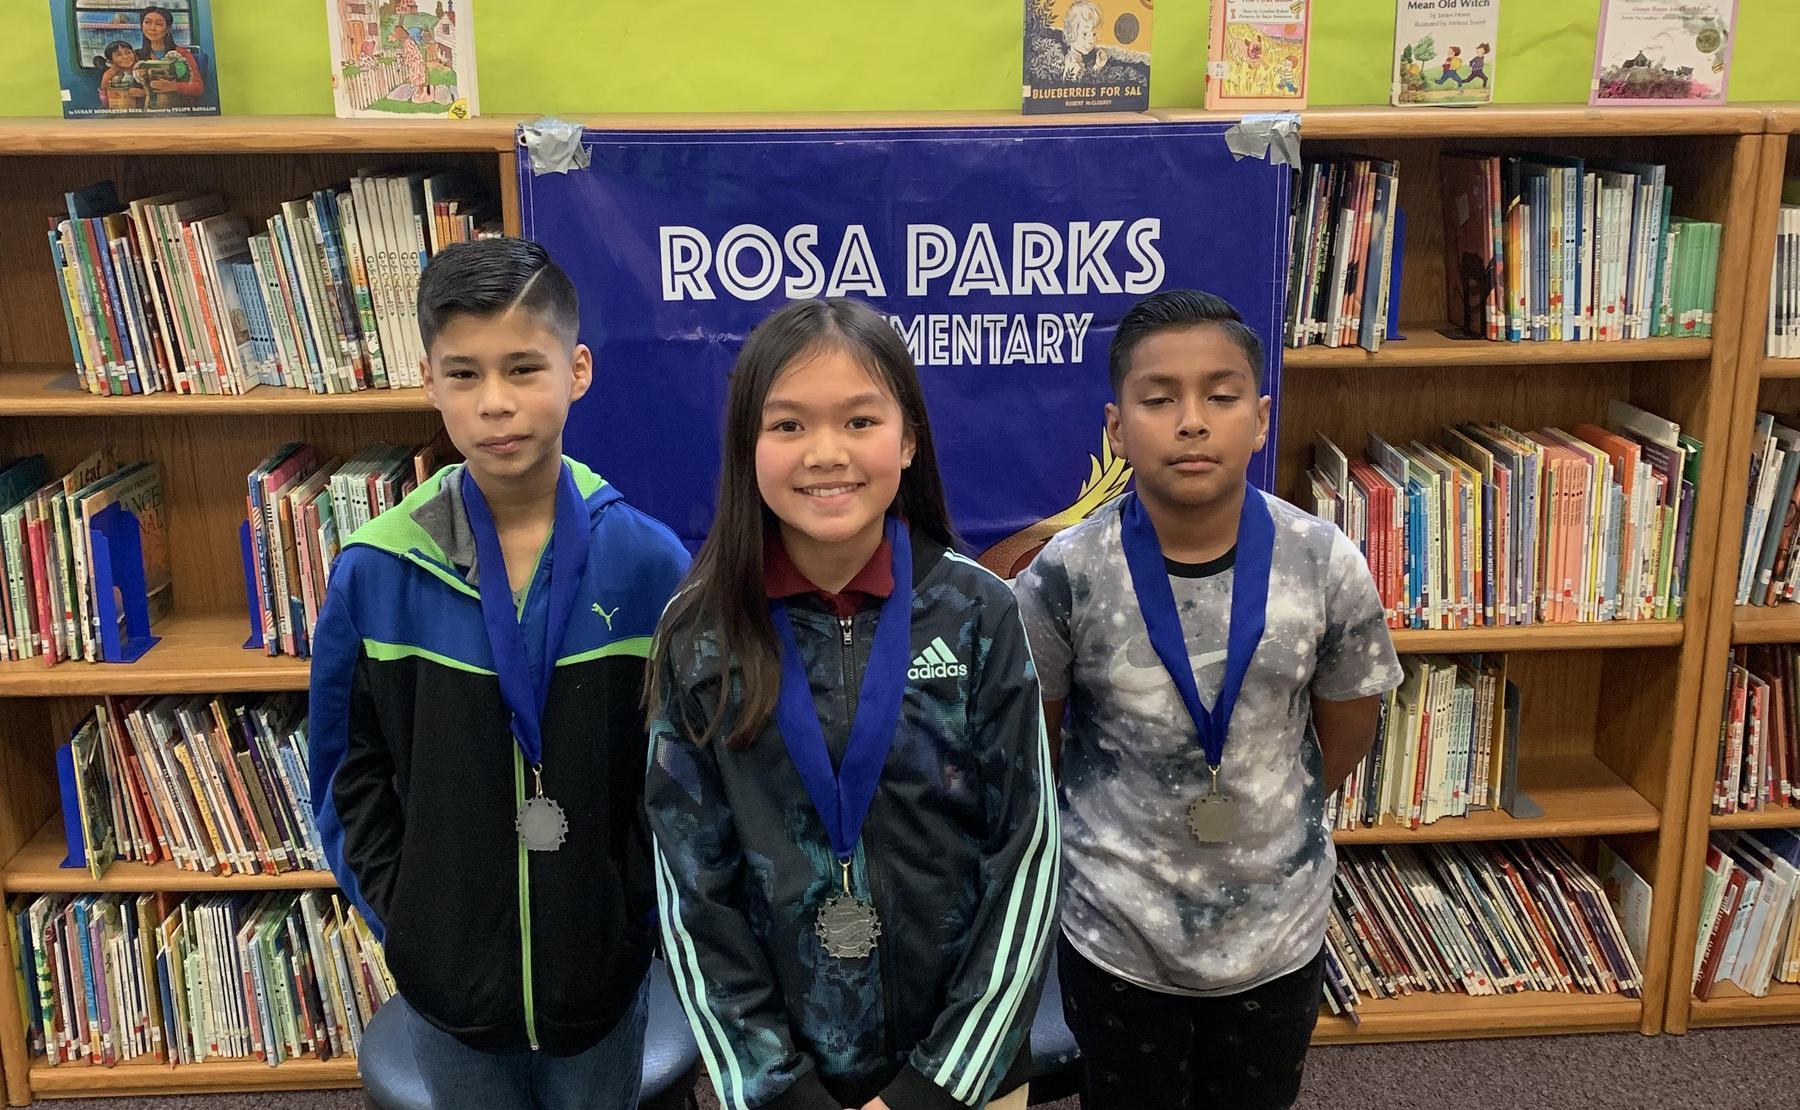 Rosa Parks Elementary School